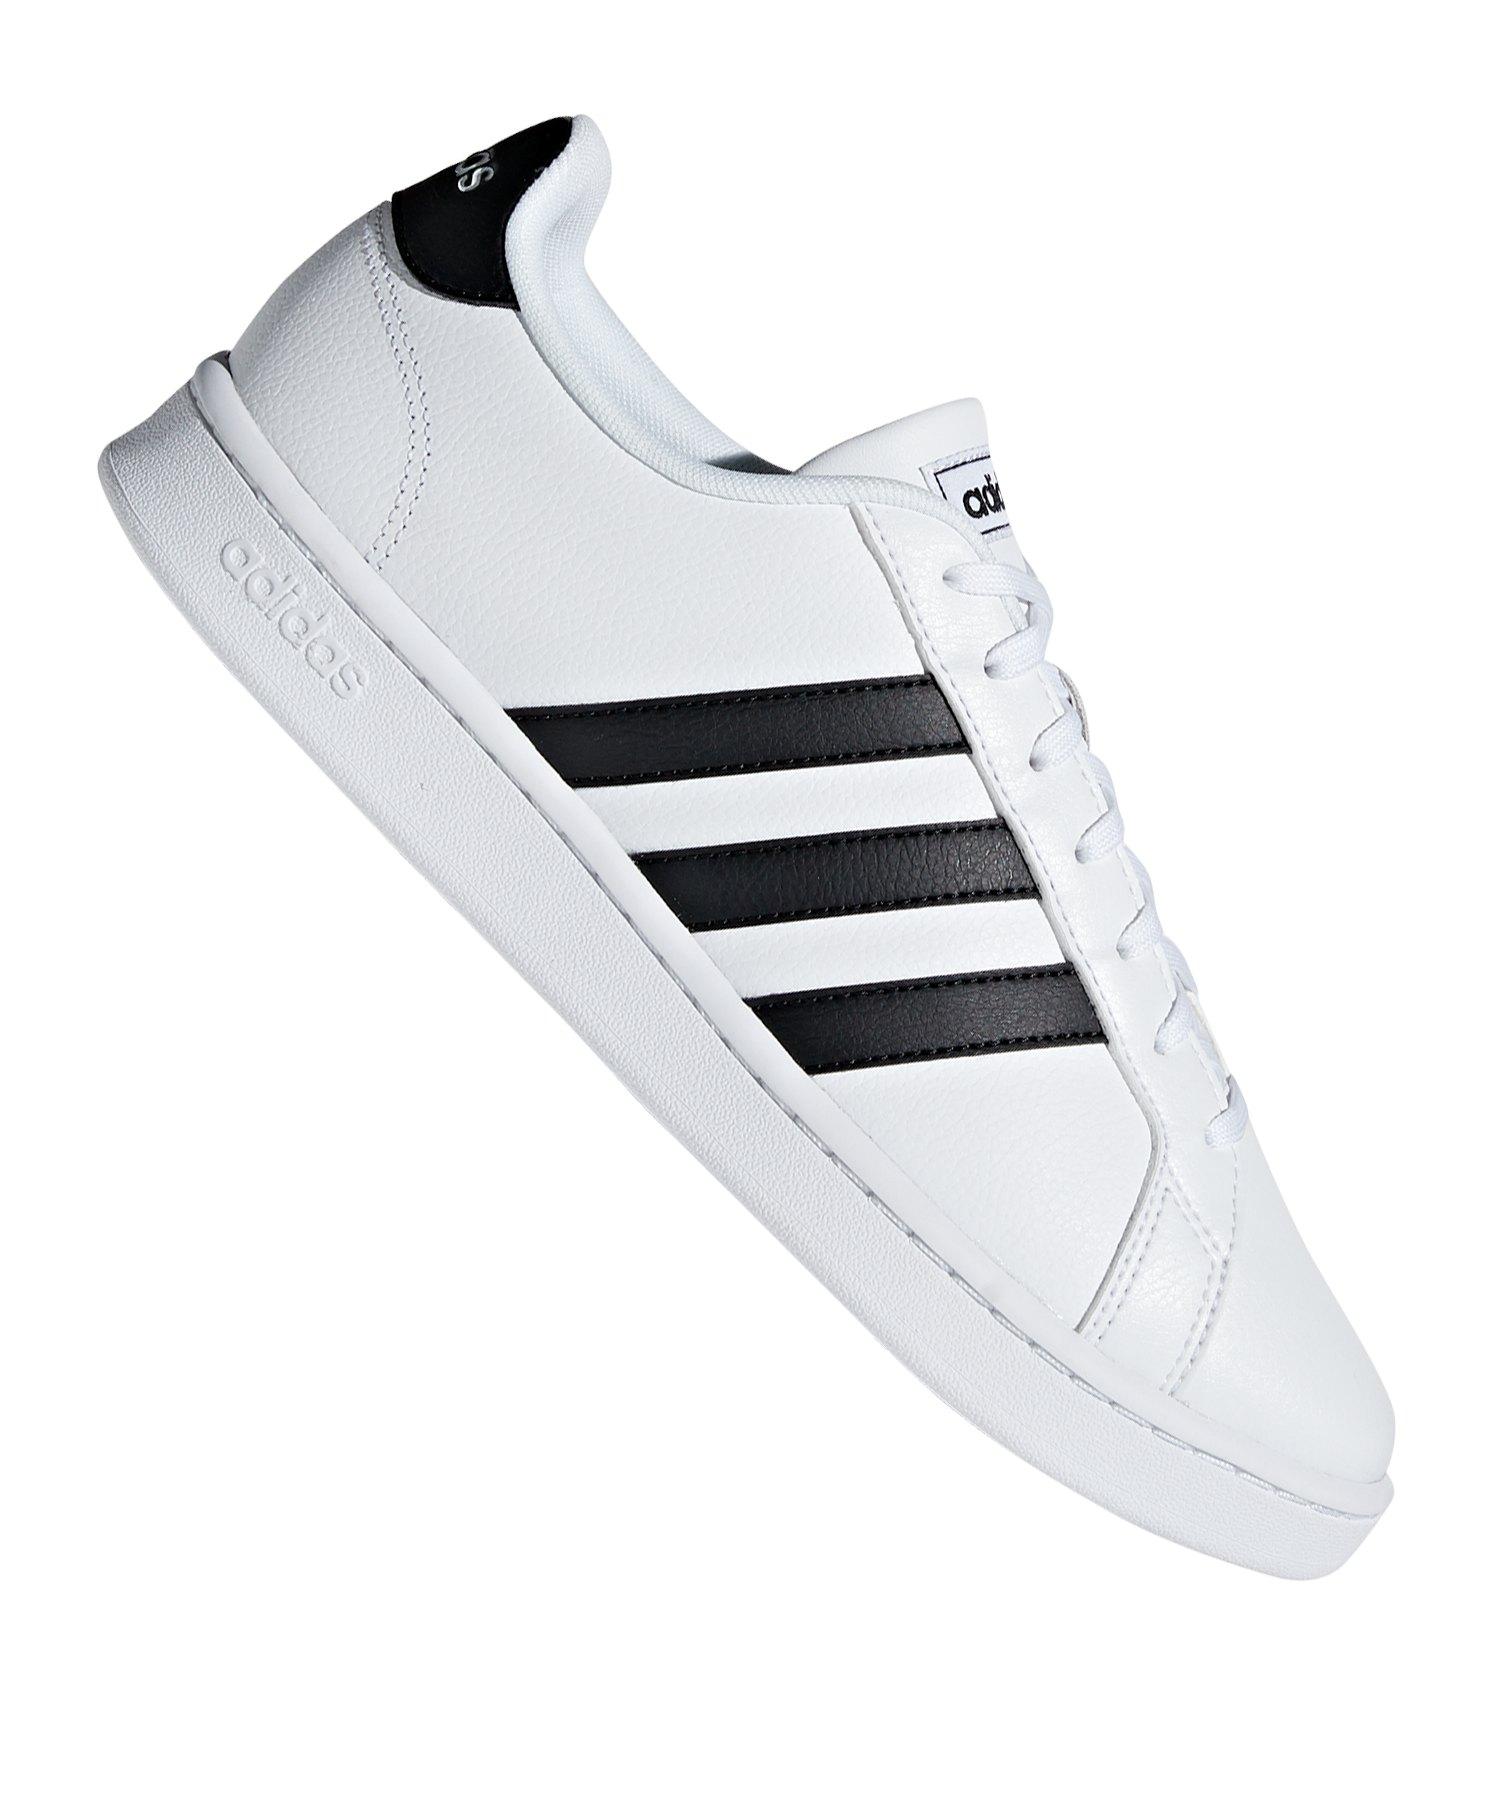 adidas sneaker, WeißSchwarz Adidas Schuhe,adidas